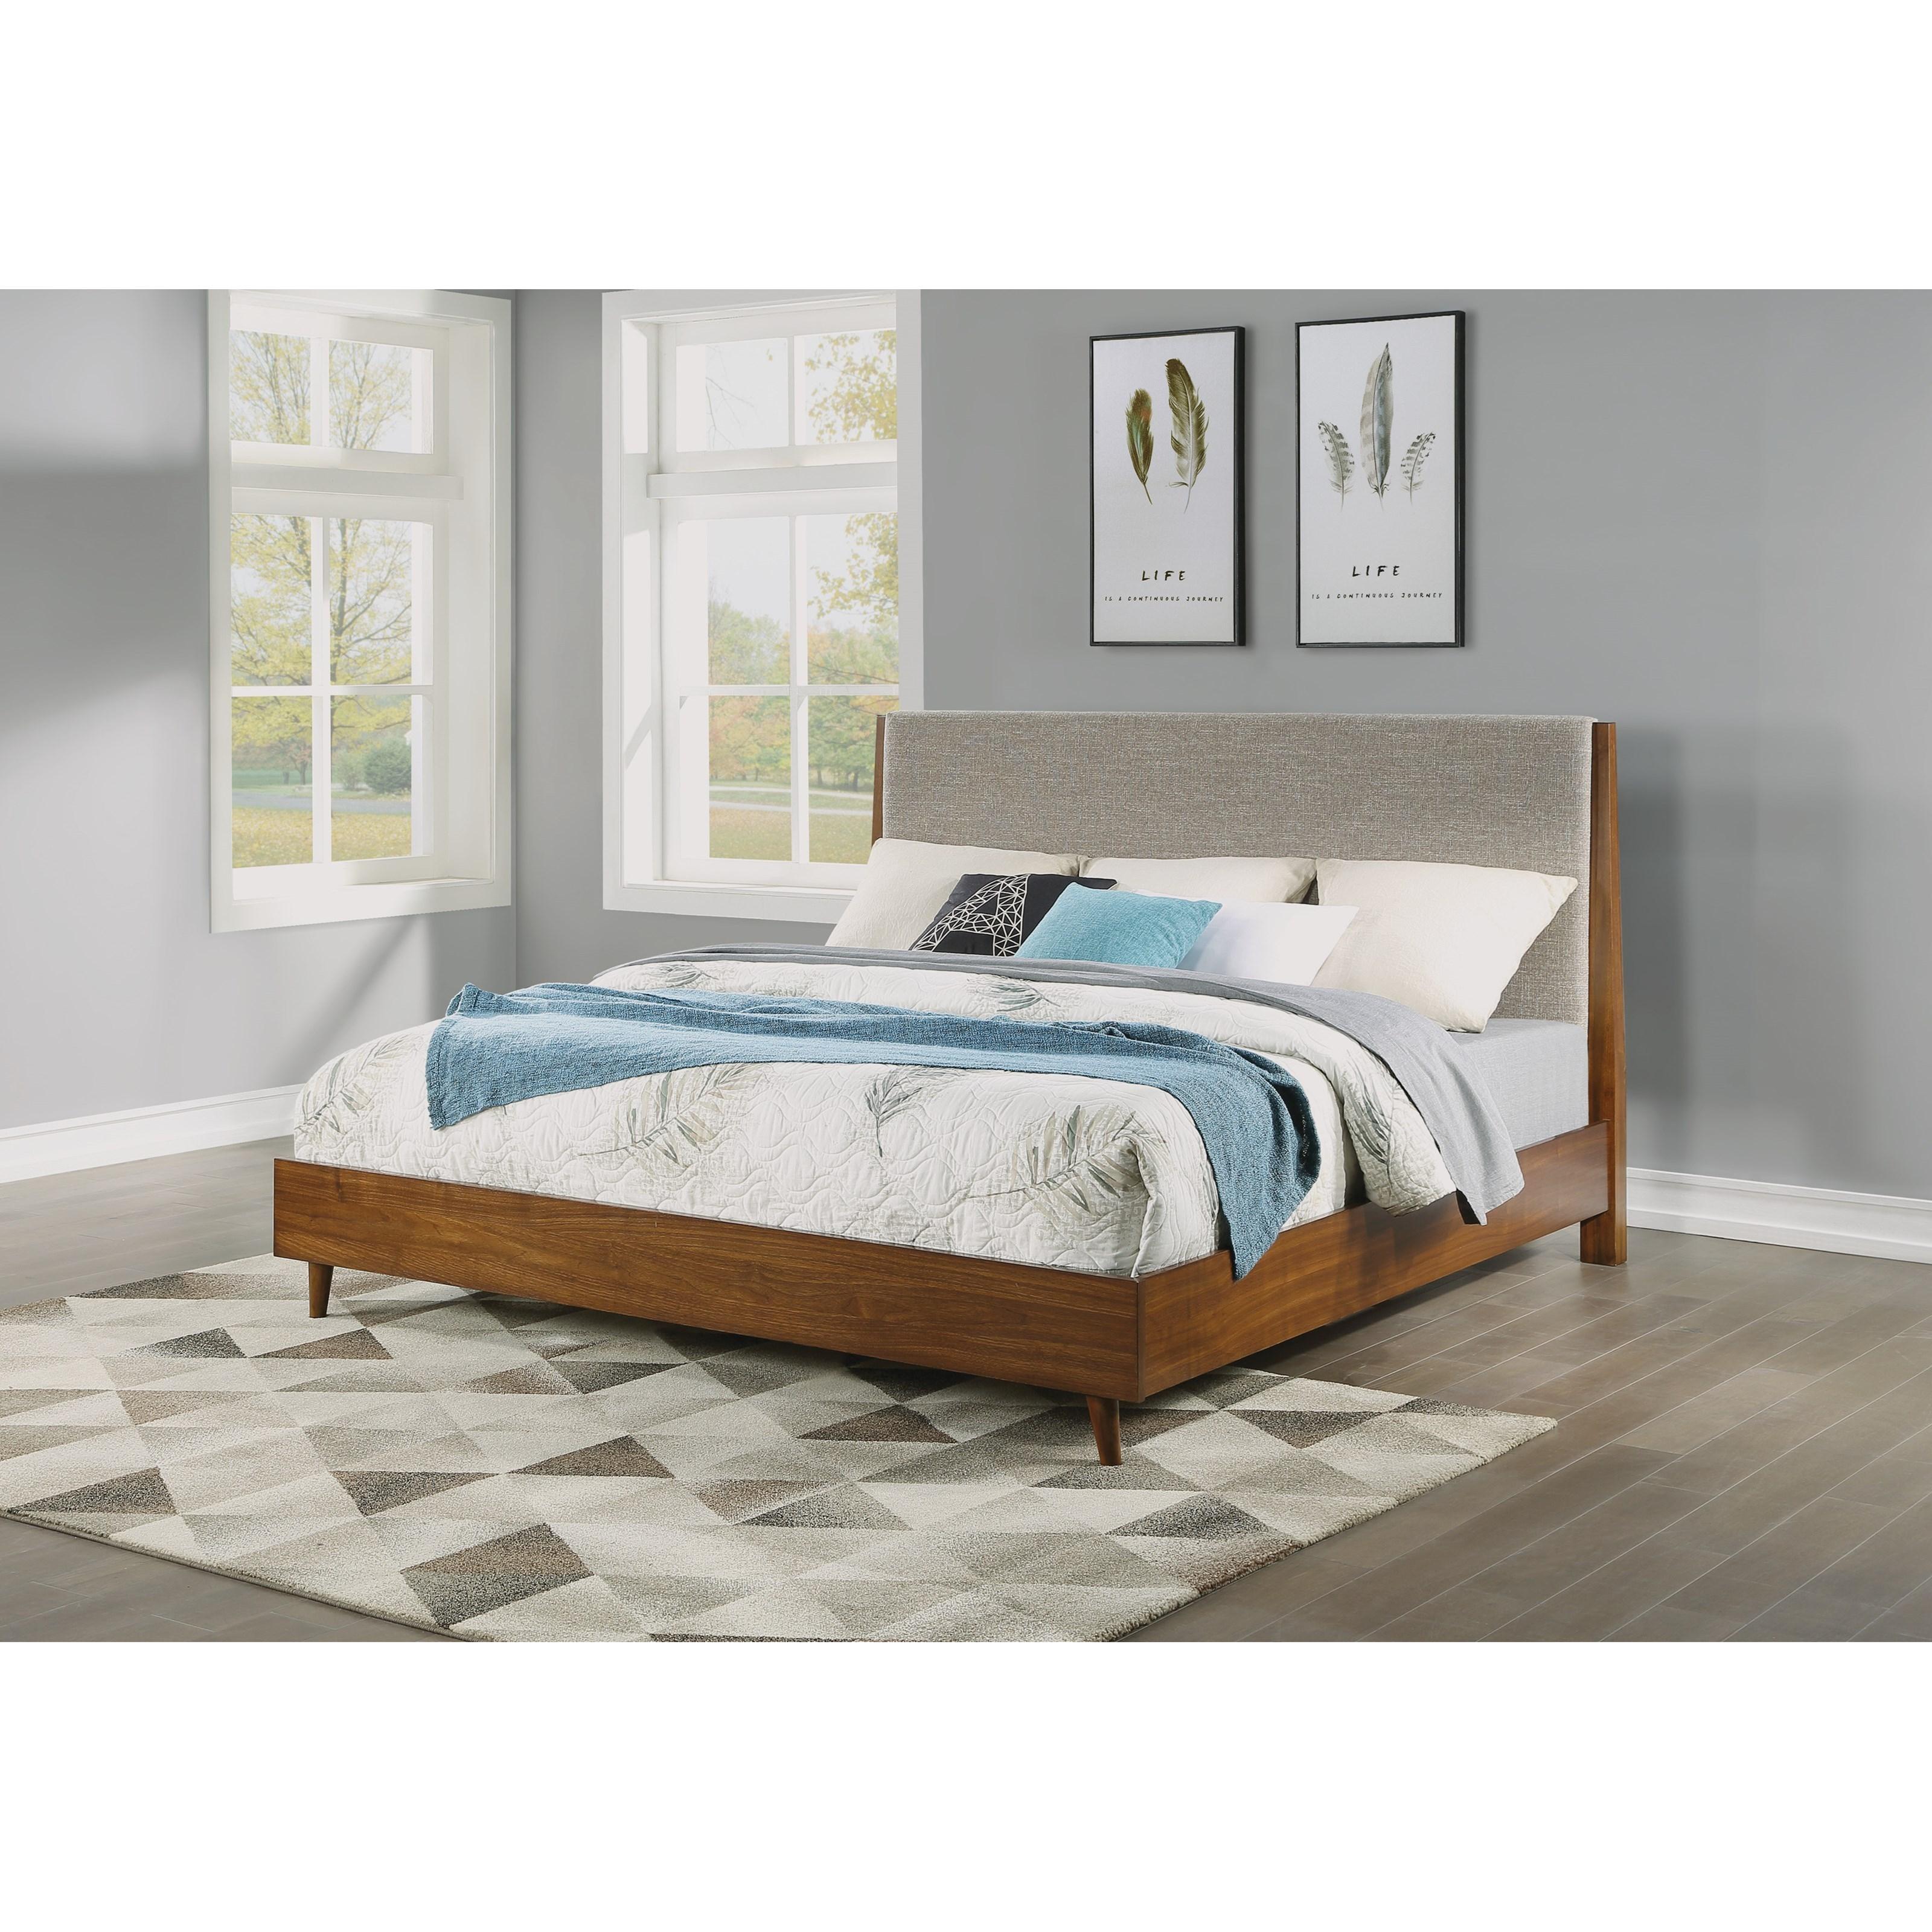 Carmen Carmen King Upholstered Bed by Flexsteel Wynwood Collection at Morris Home